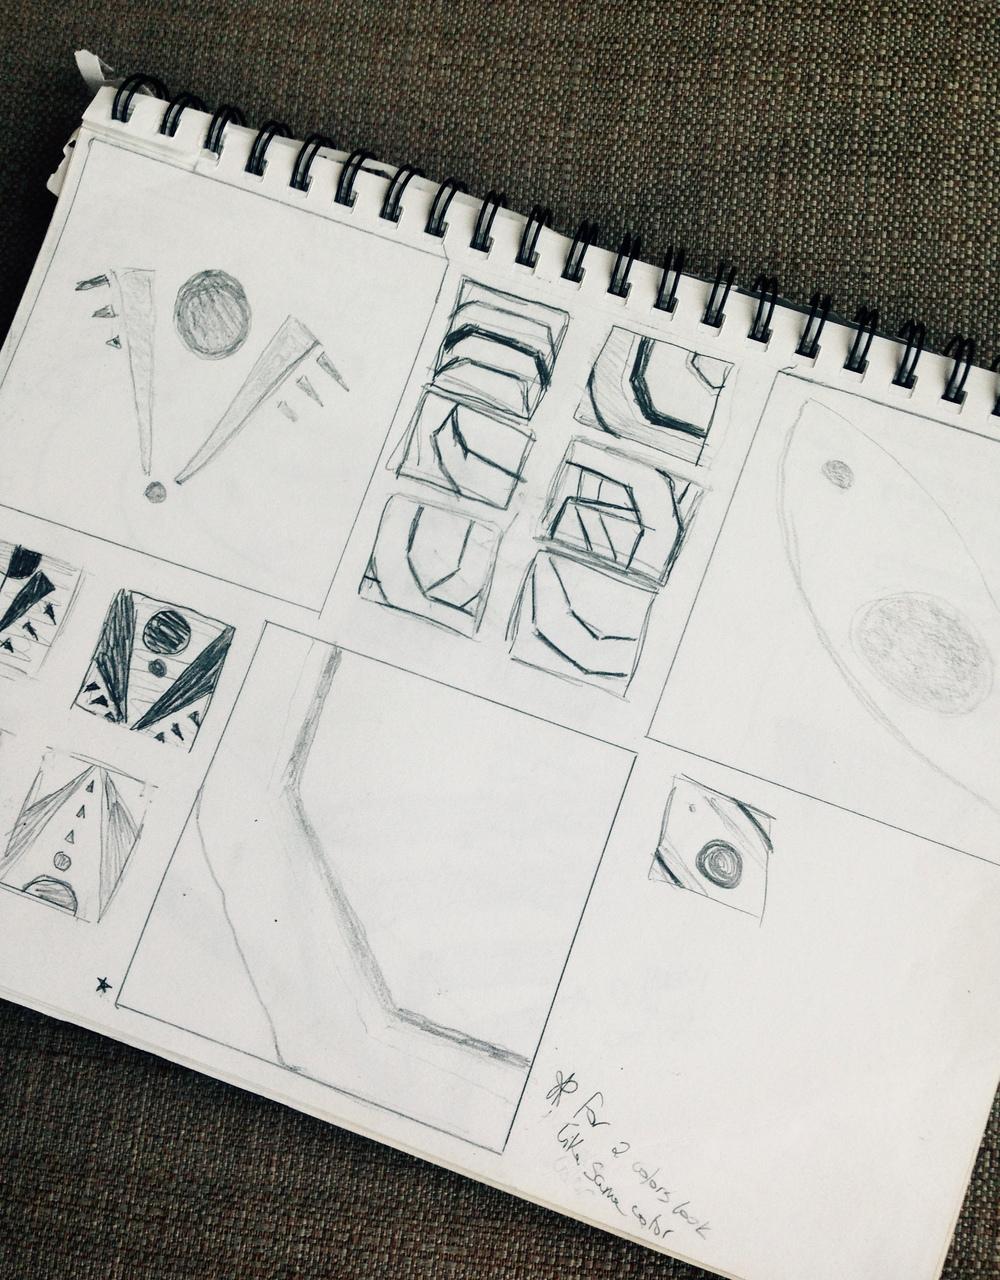 Sketch for Modern 1 | Tannie Smith